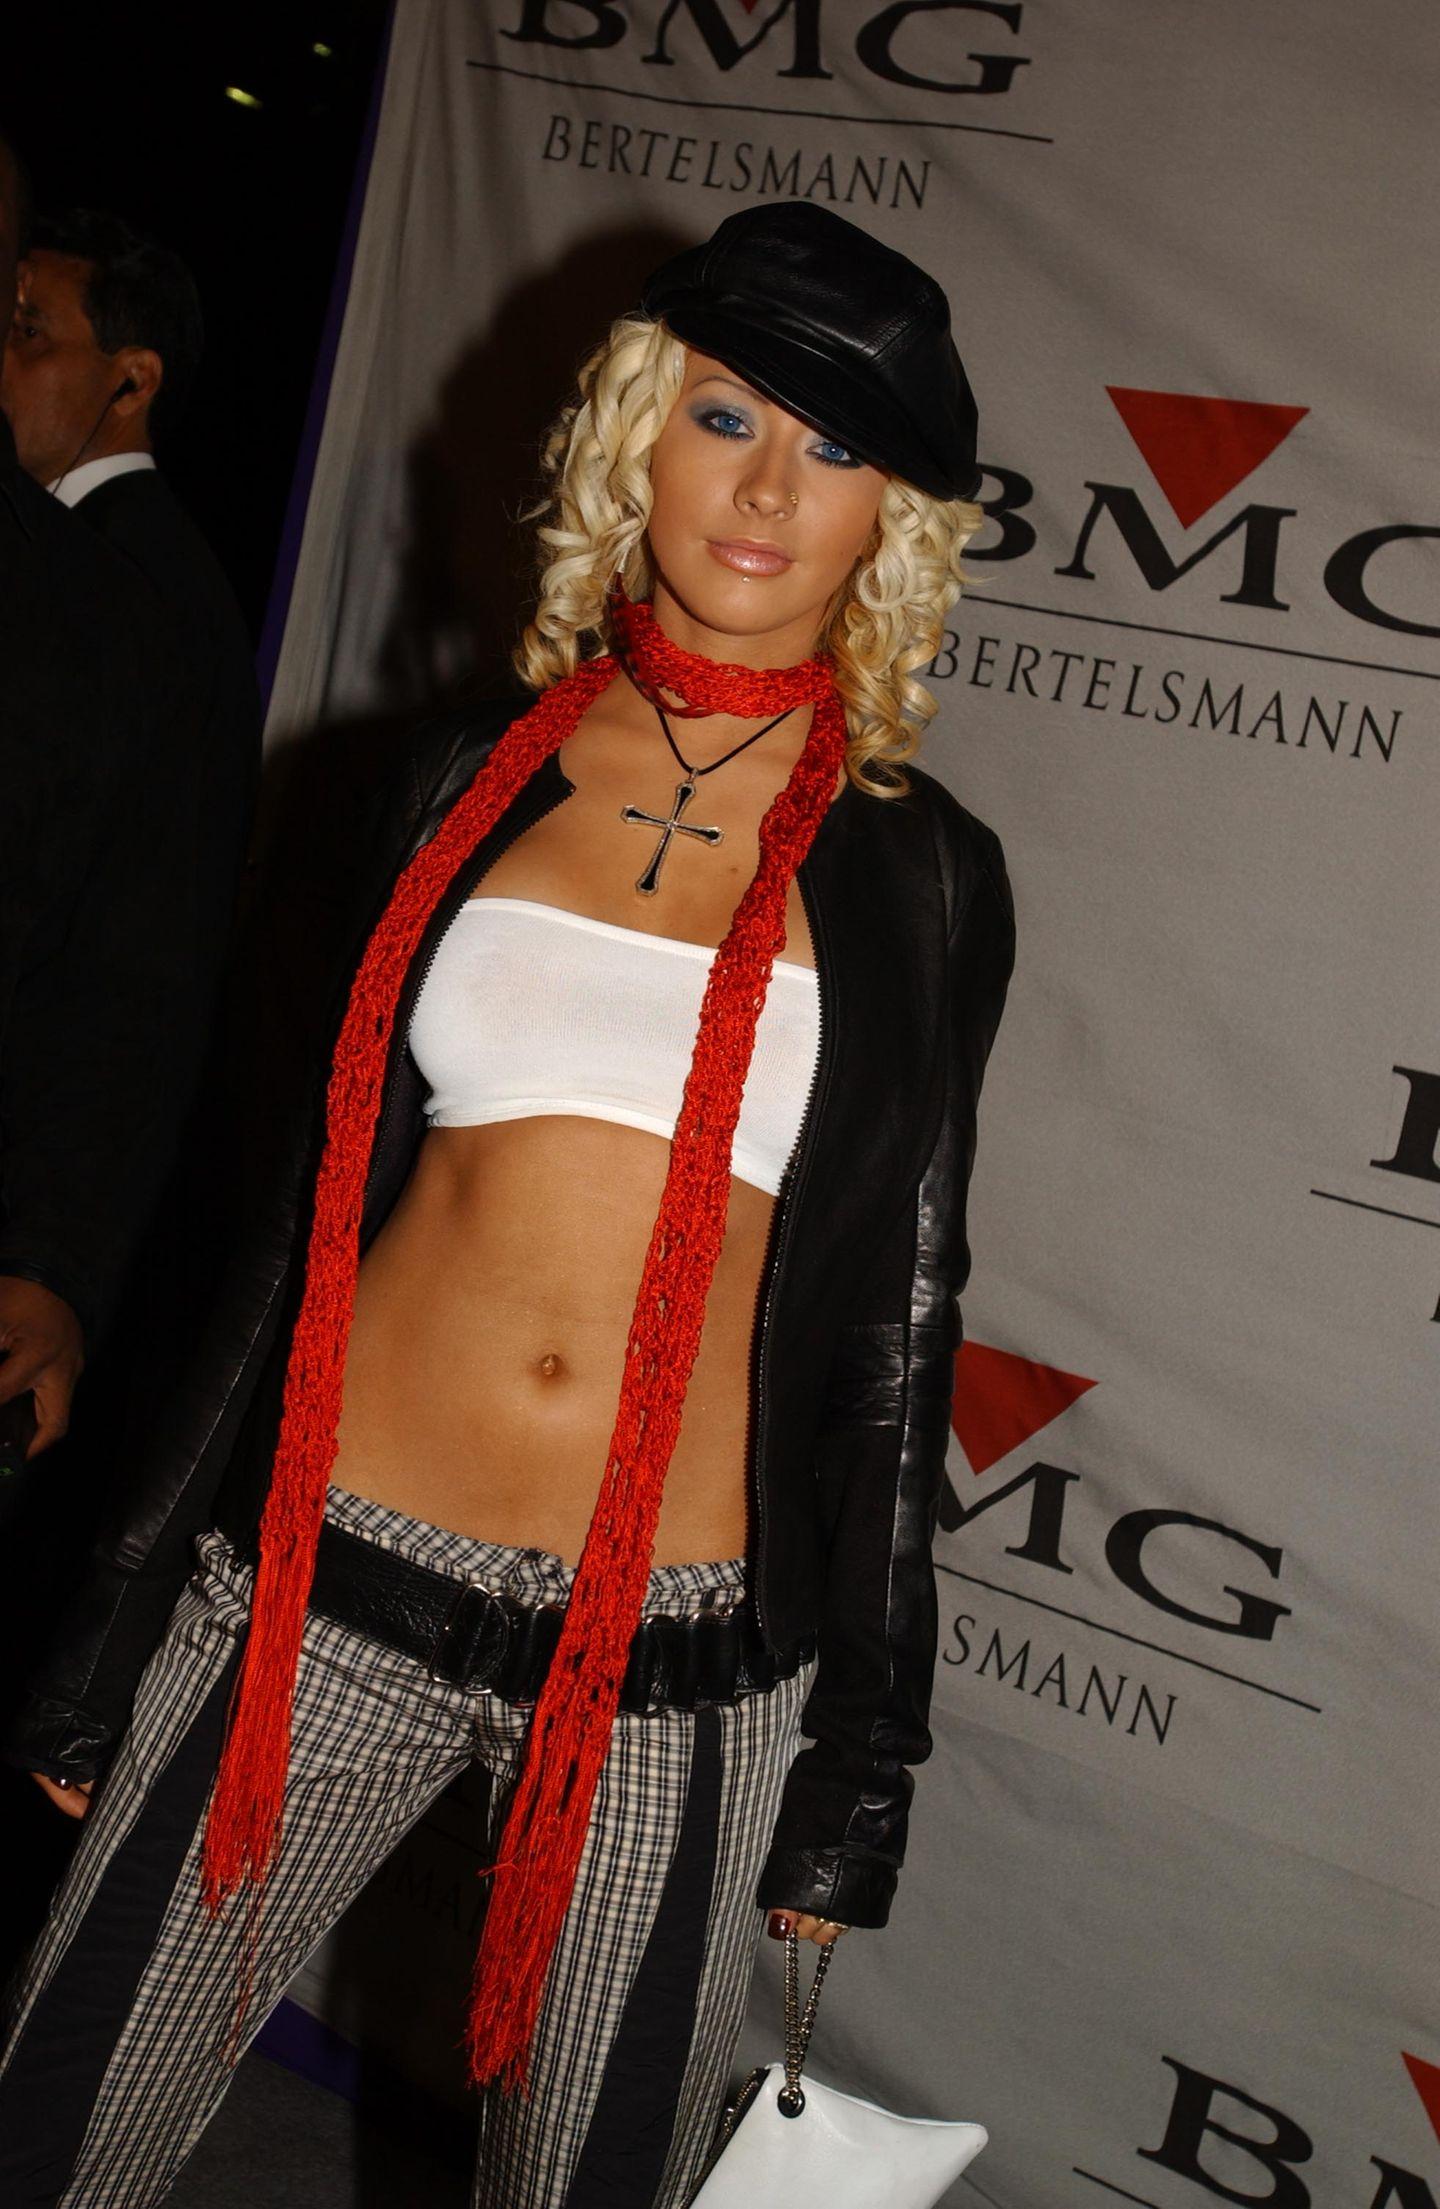 2000er Modetrends: Christina Aguilera